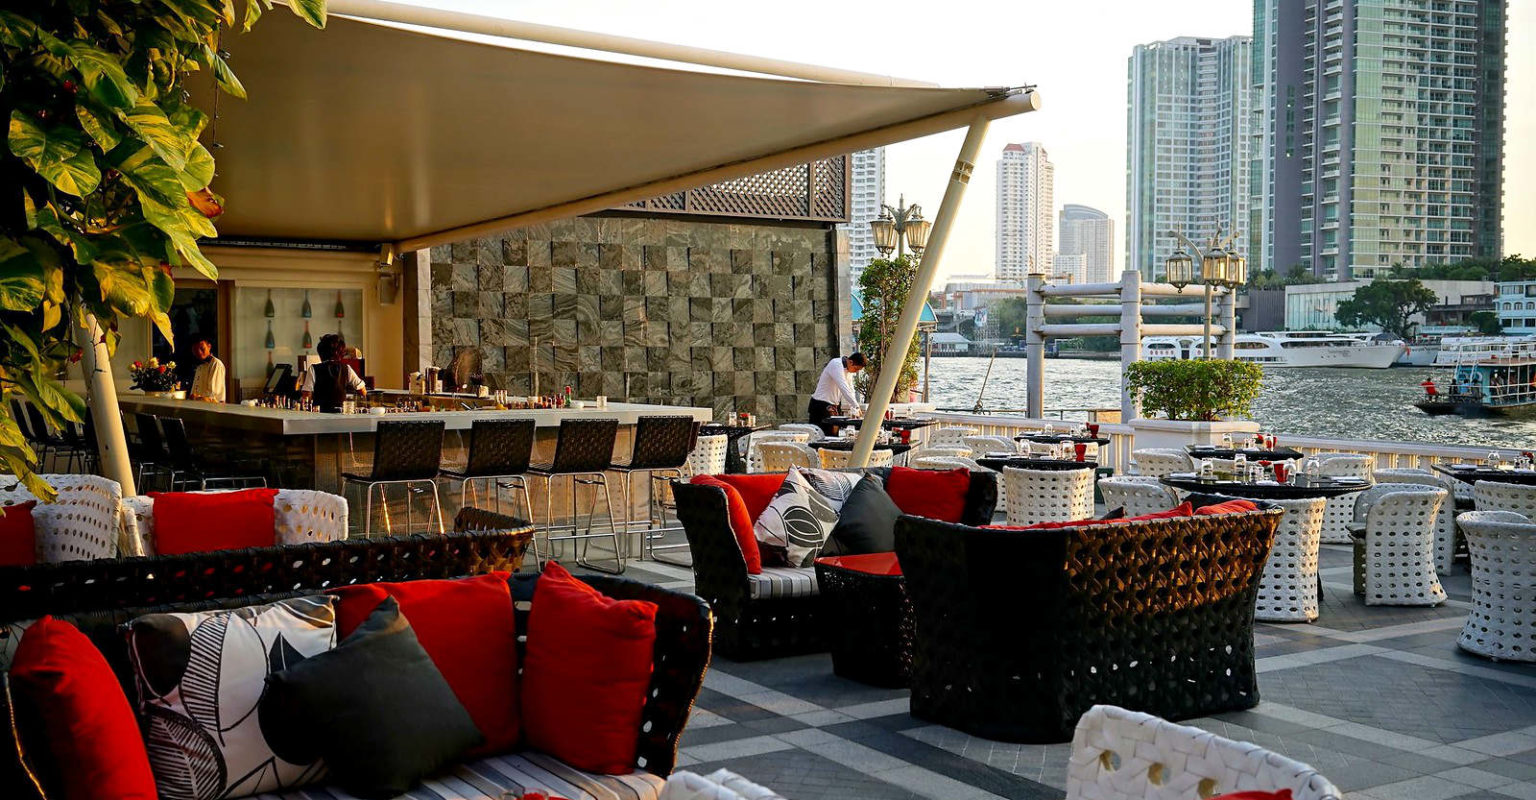 Mandarin Oriental Hotel with terrace on the Chao Phraya River of Bangkok